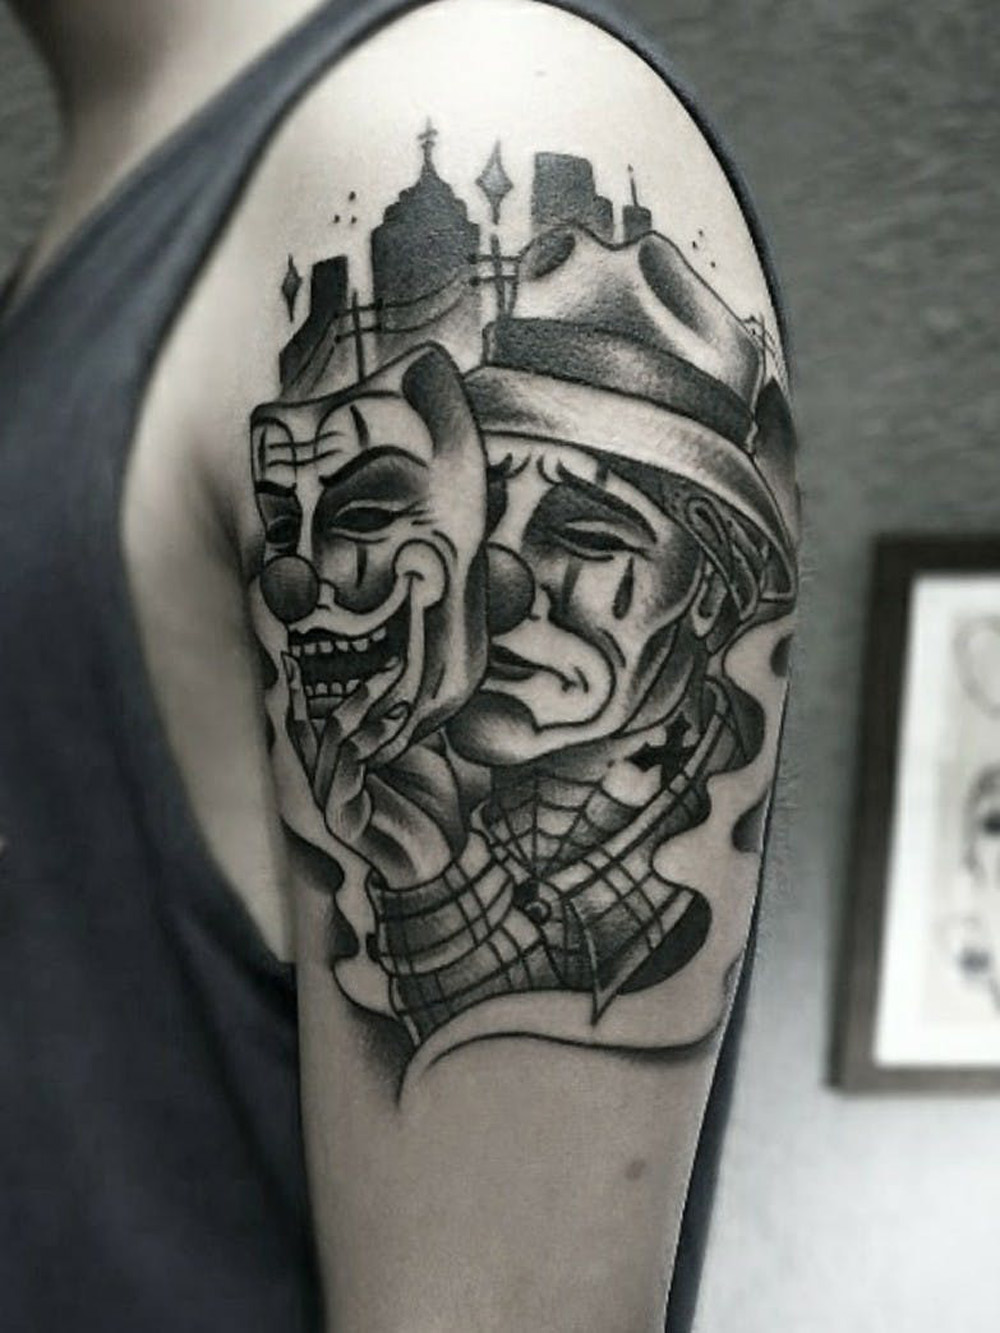 Tatuagem Chora Agora Ri Depois Amo Tatuagem